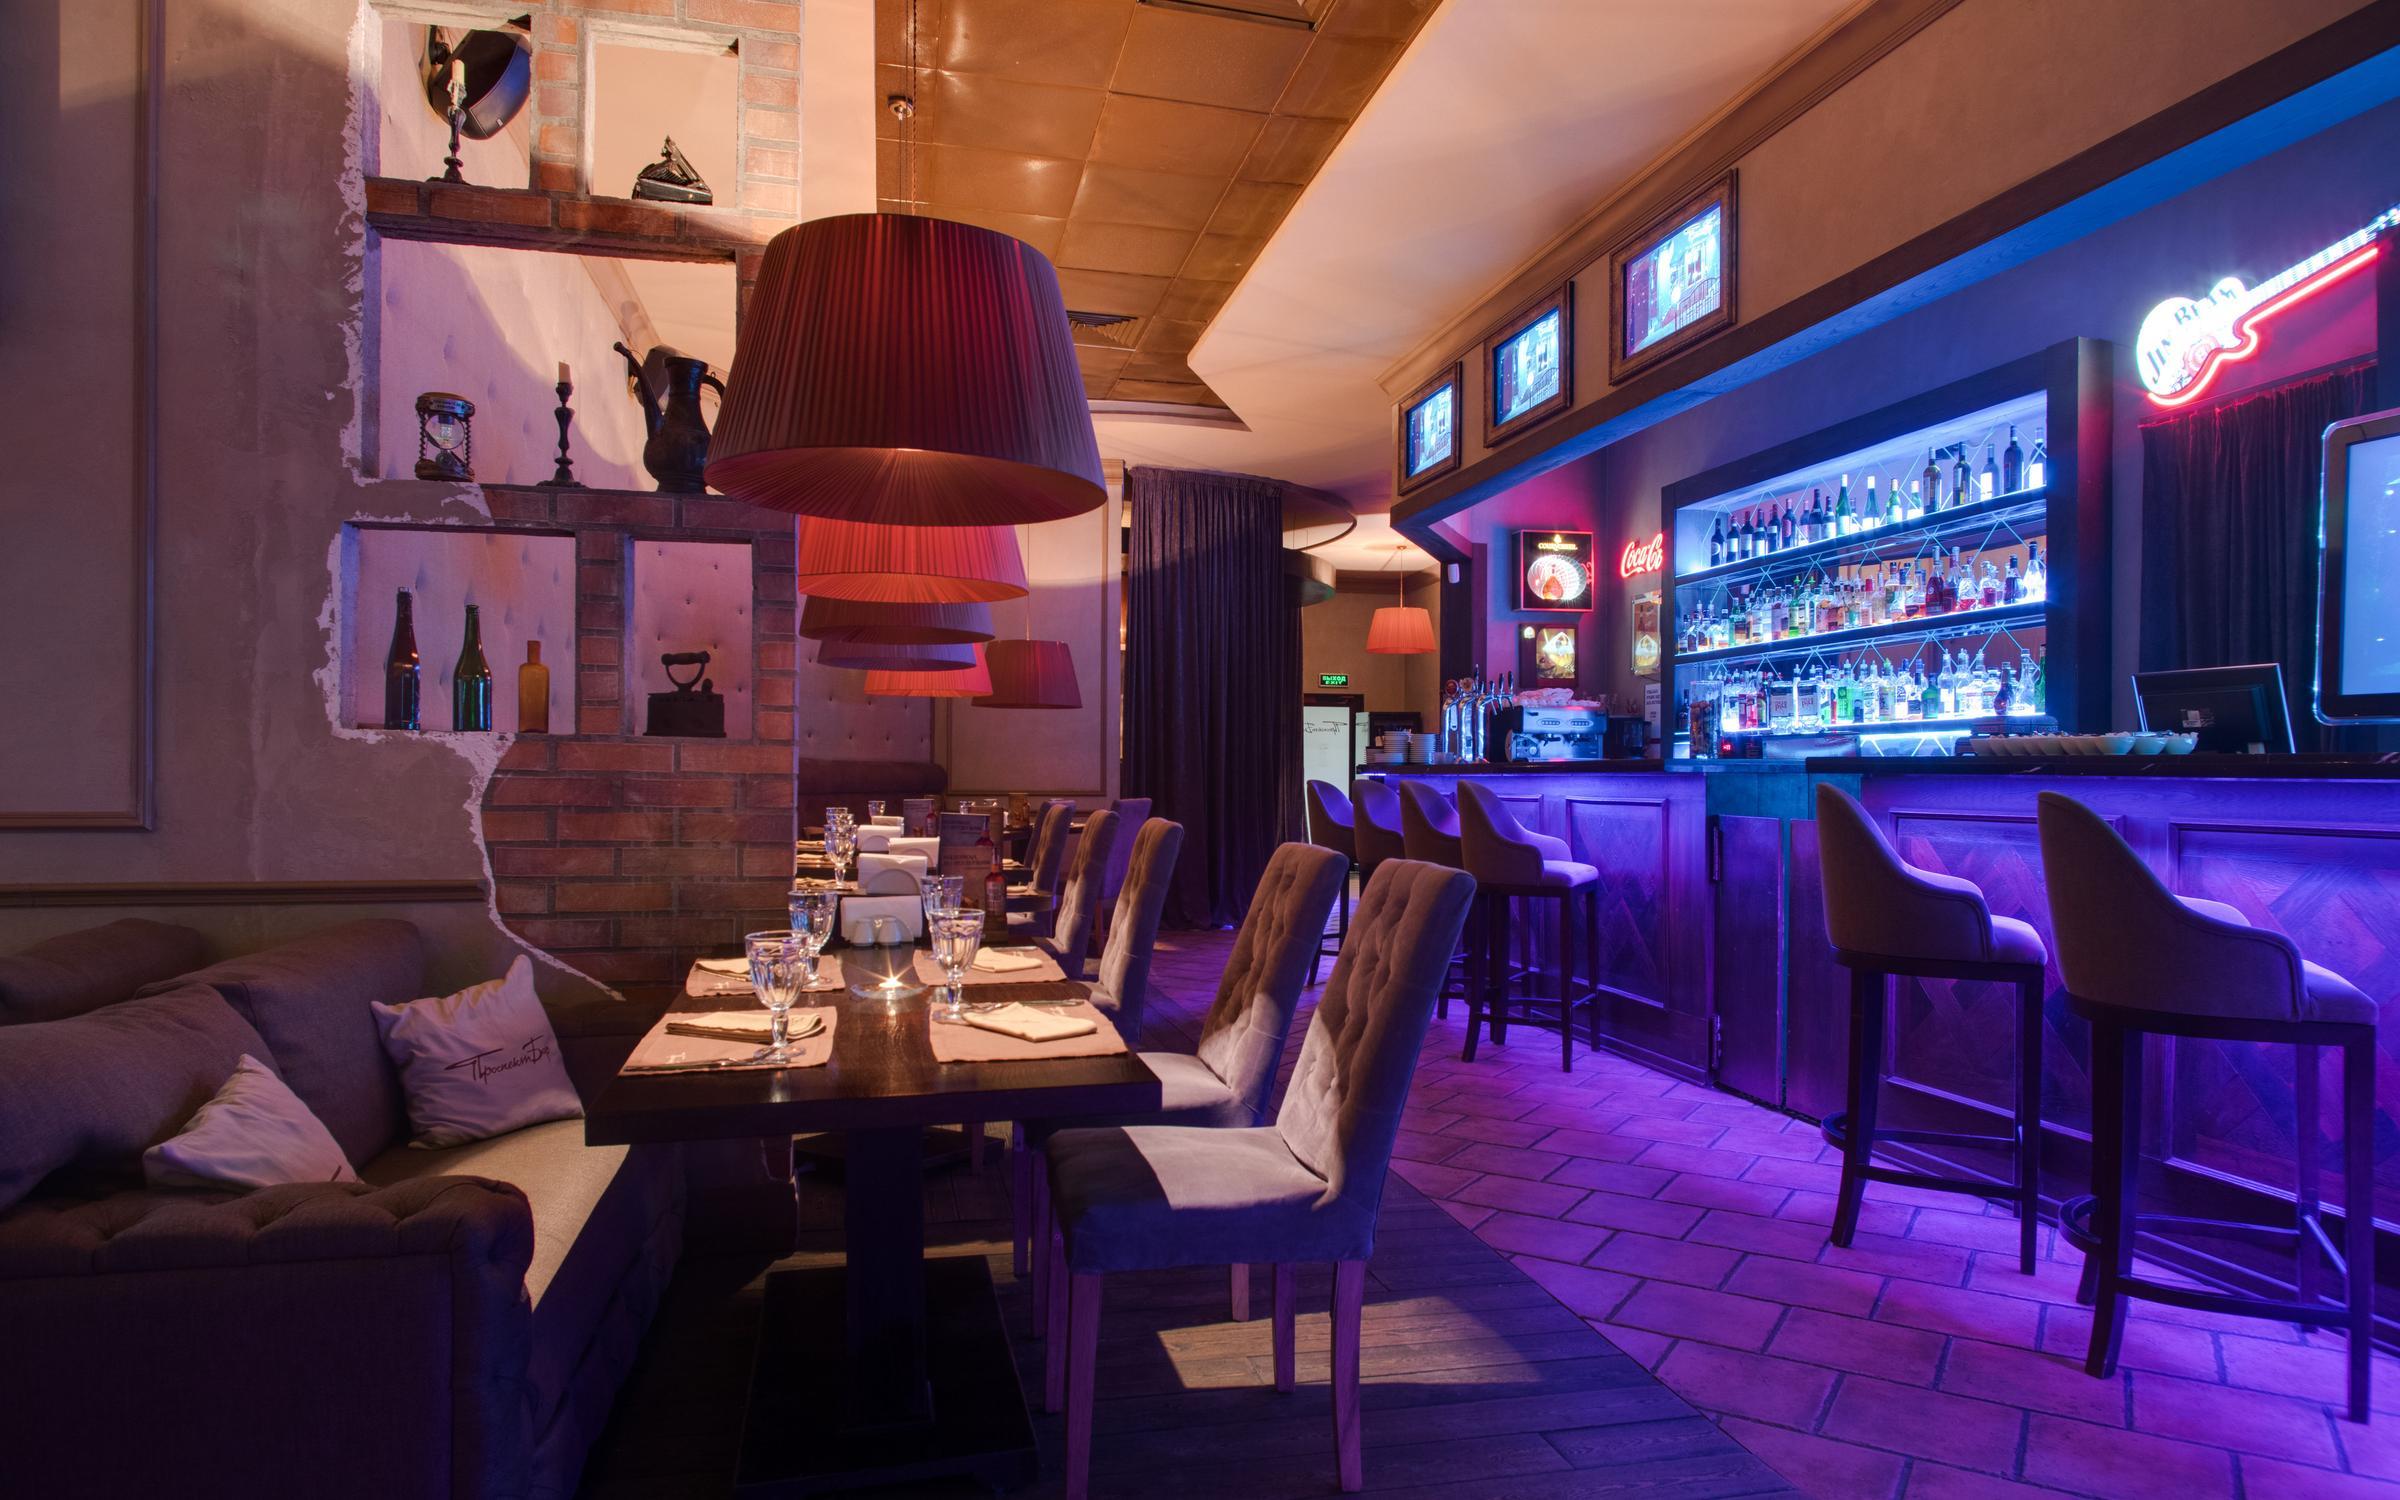 фотография Ресторана My Place на улице Щепкина